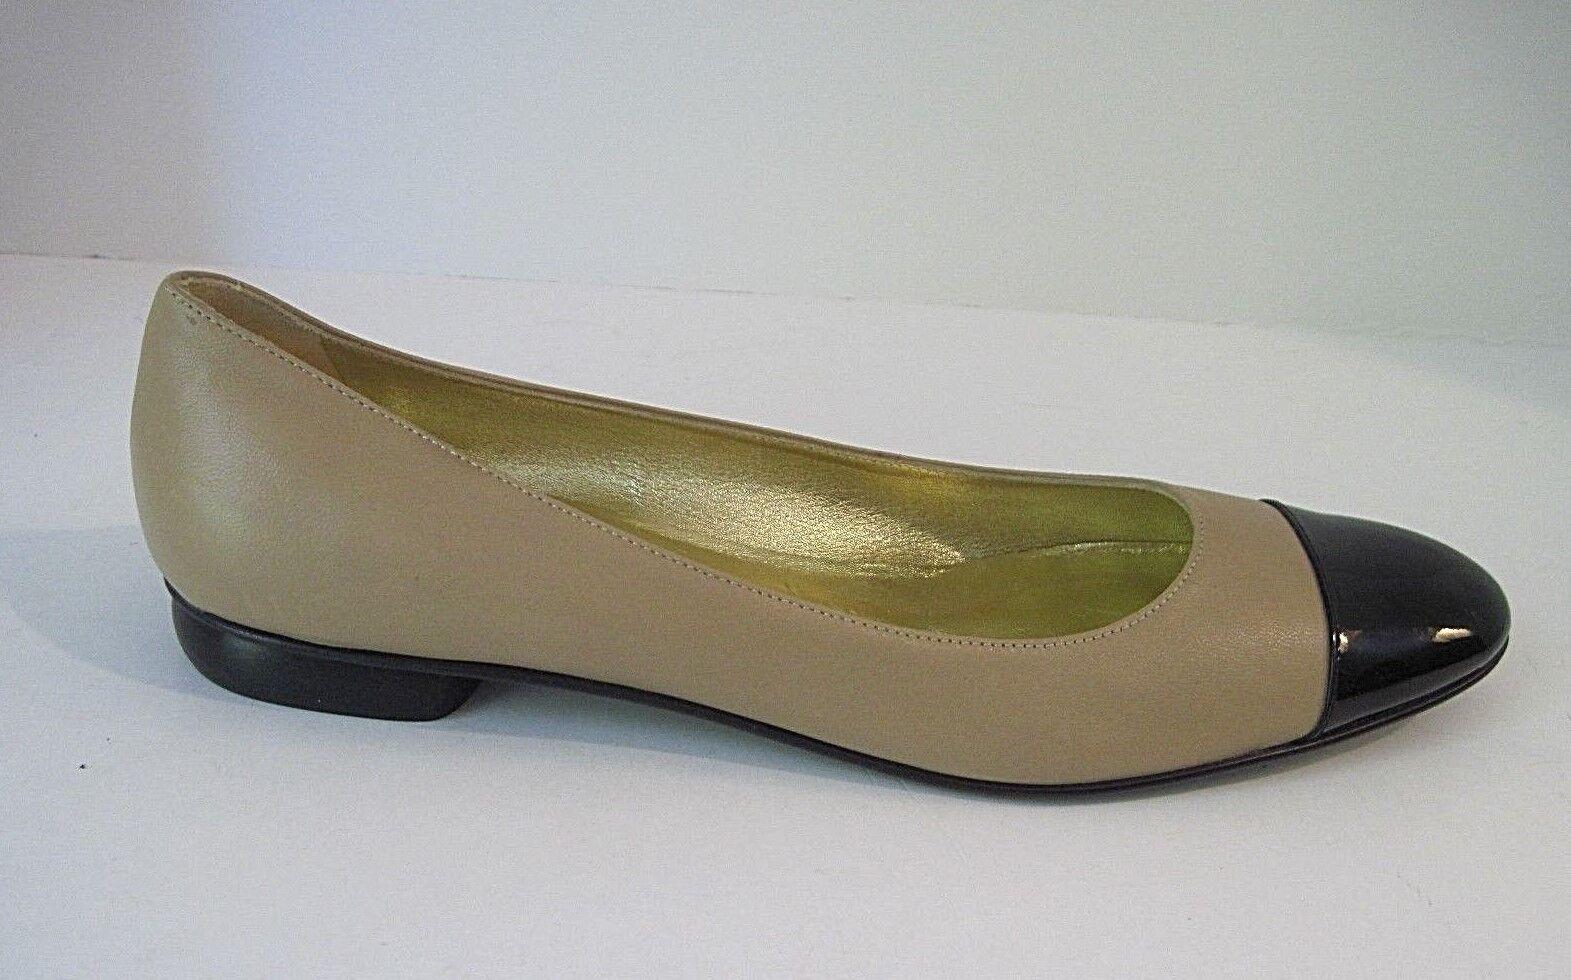 CALIGARIUS Bob Ellis Beige Leather Black Patent Leather Flats Size shoes 11 2A